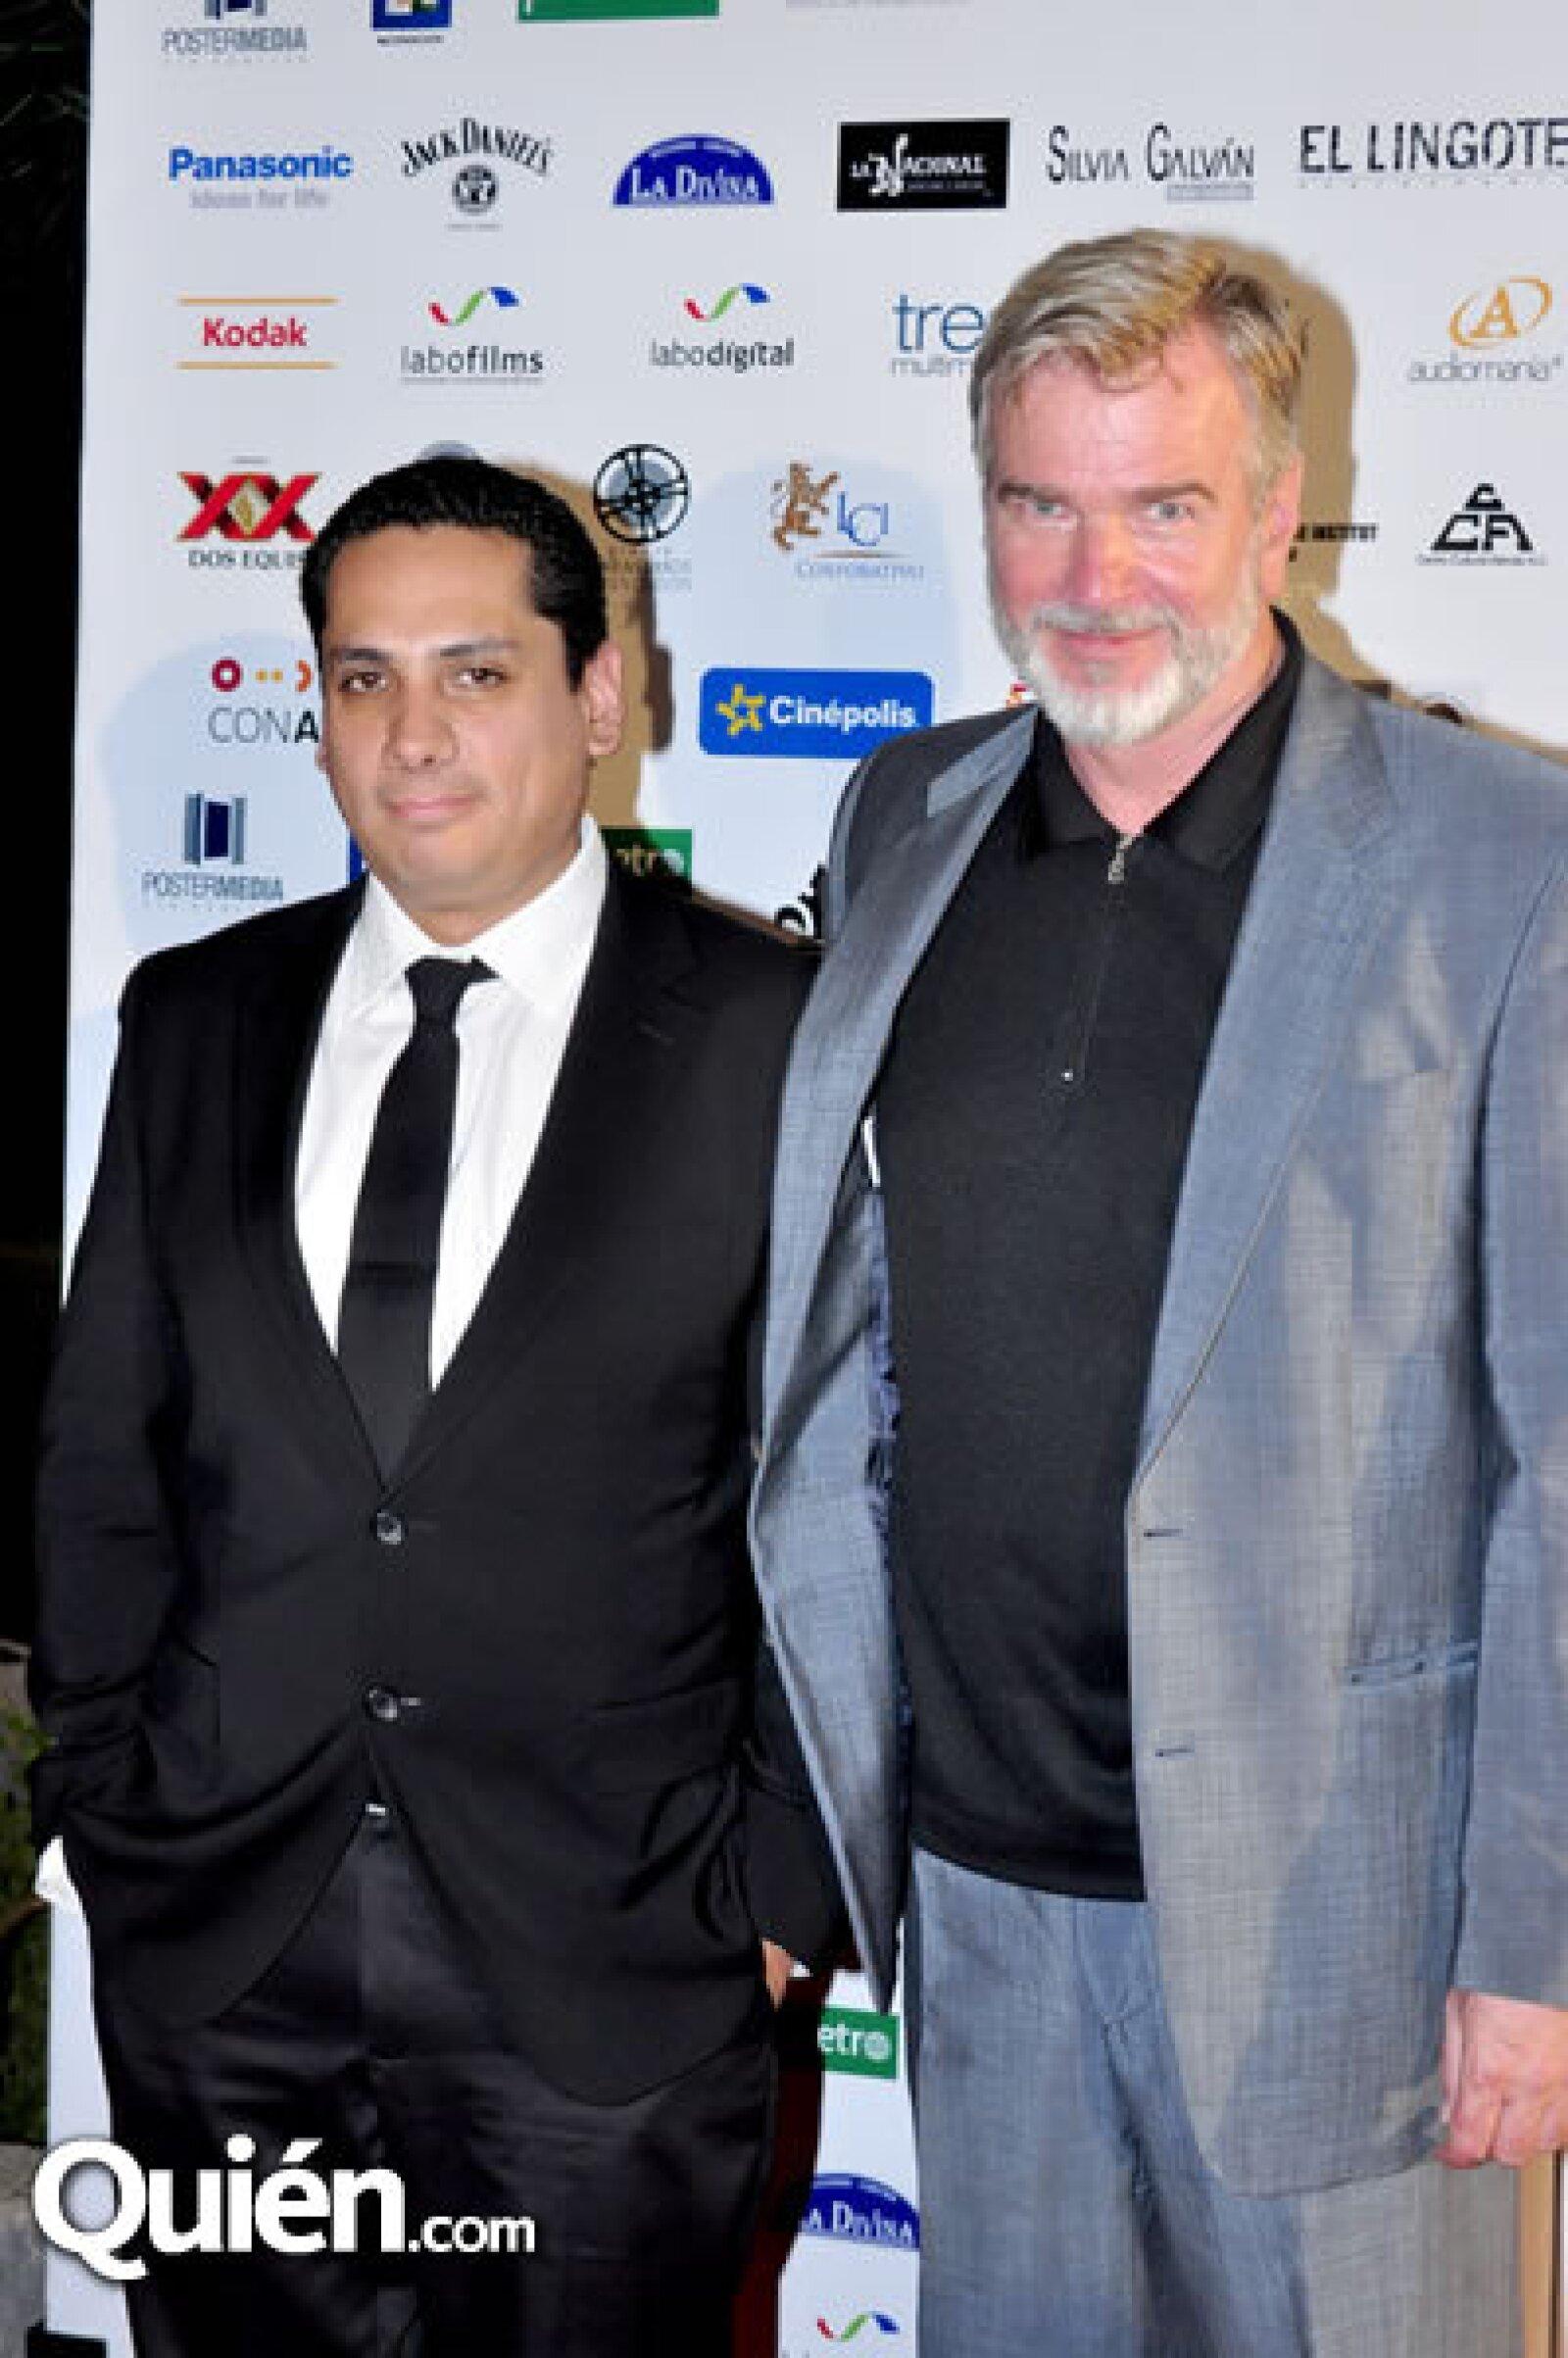 Eduardo Lucatero y Wieland Speck